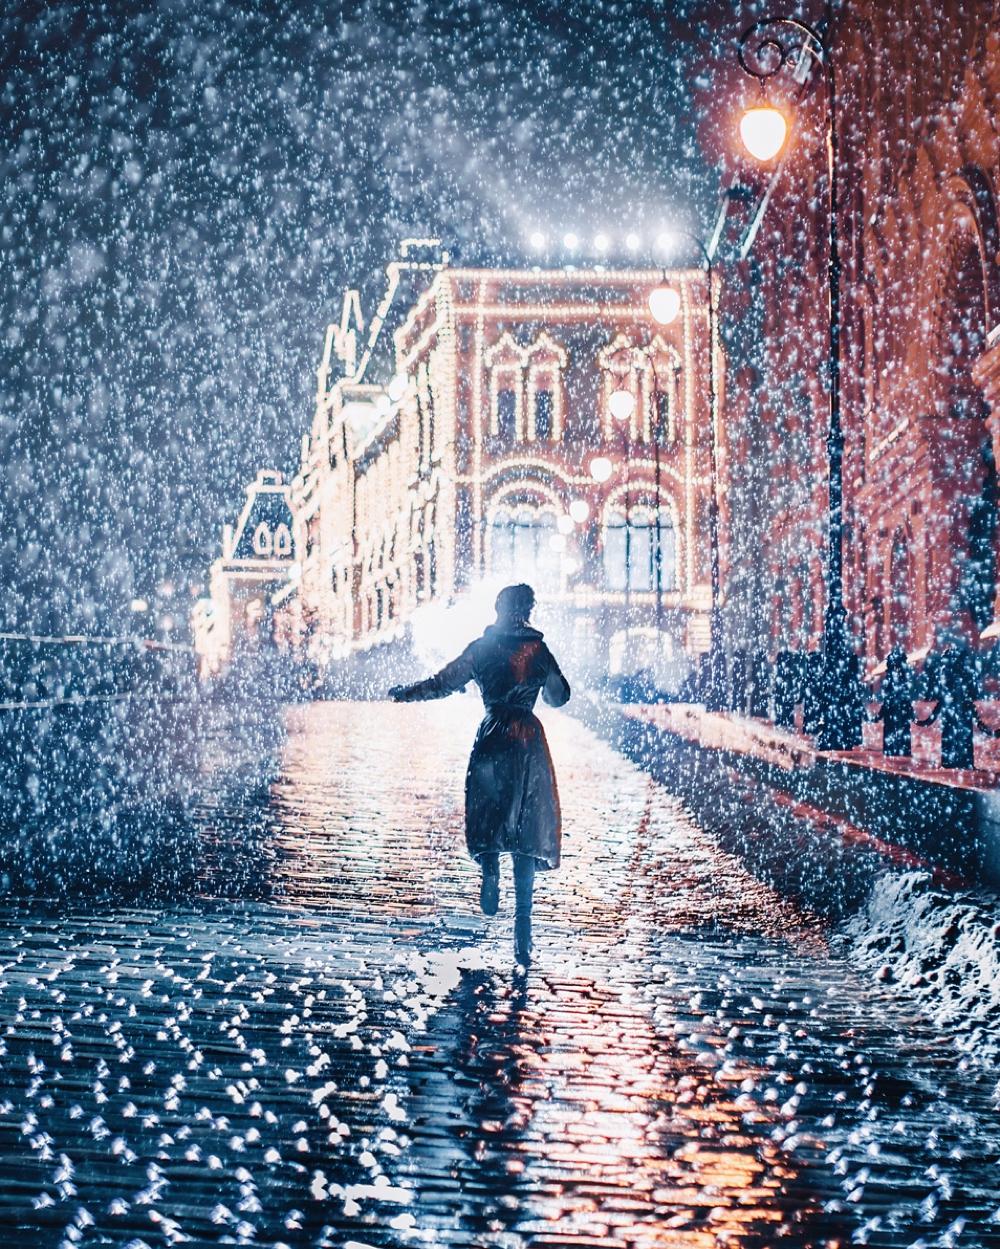 kristina-makeeva-moscow-fairytale-winter_0015